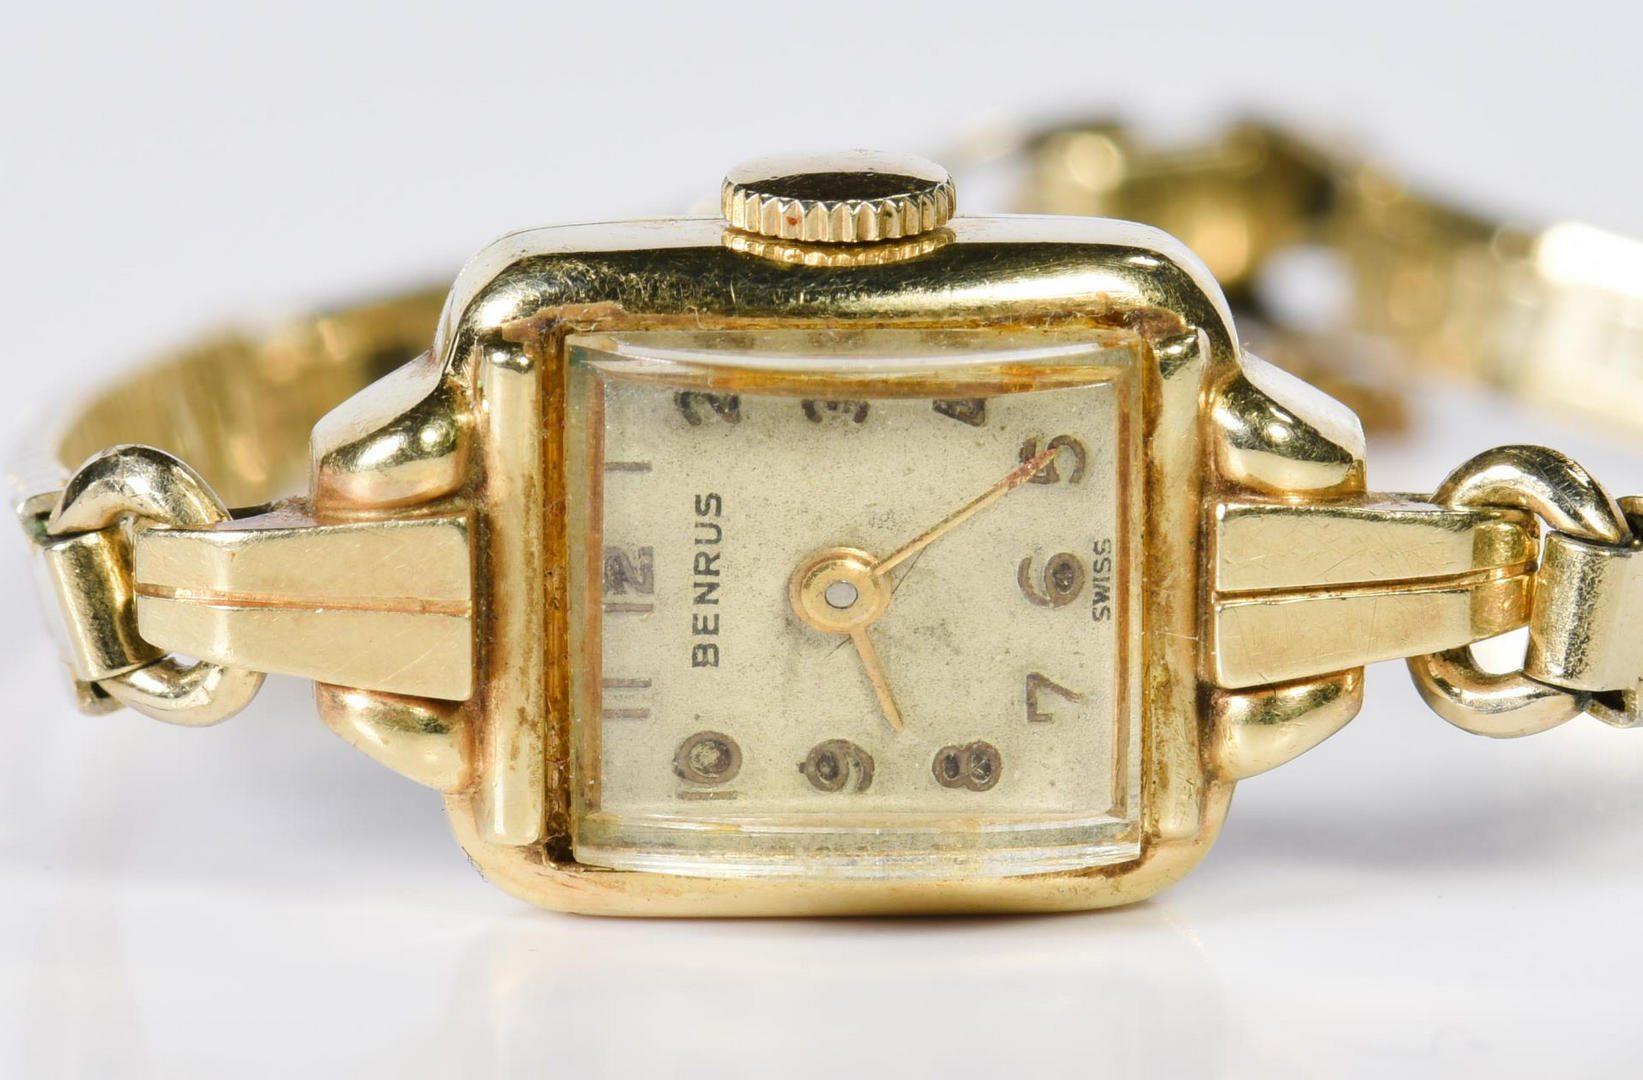 Lot 217: 4 14K Watch faces, incl Movado